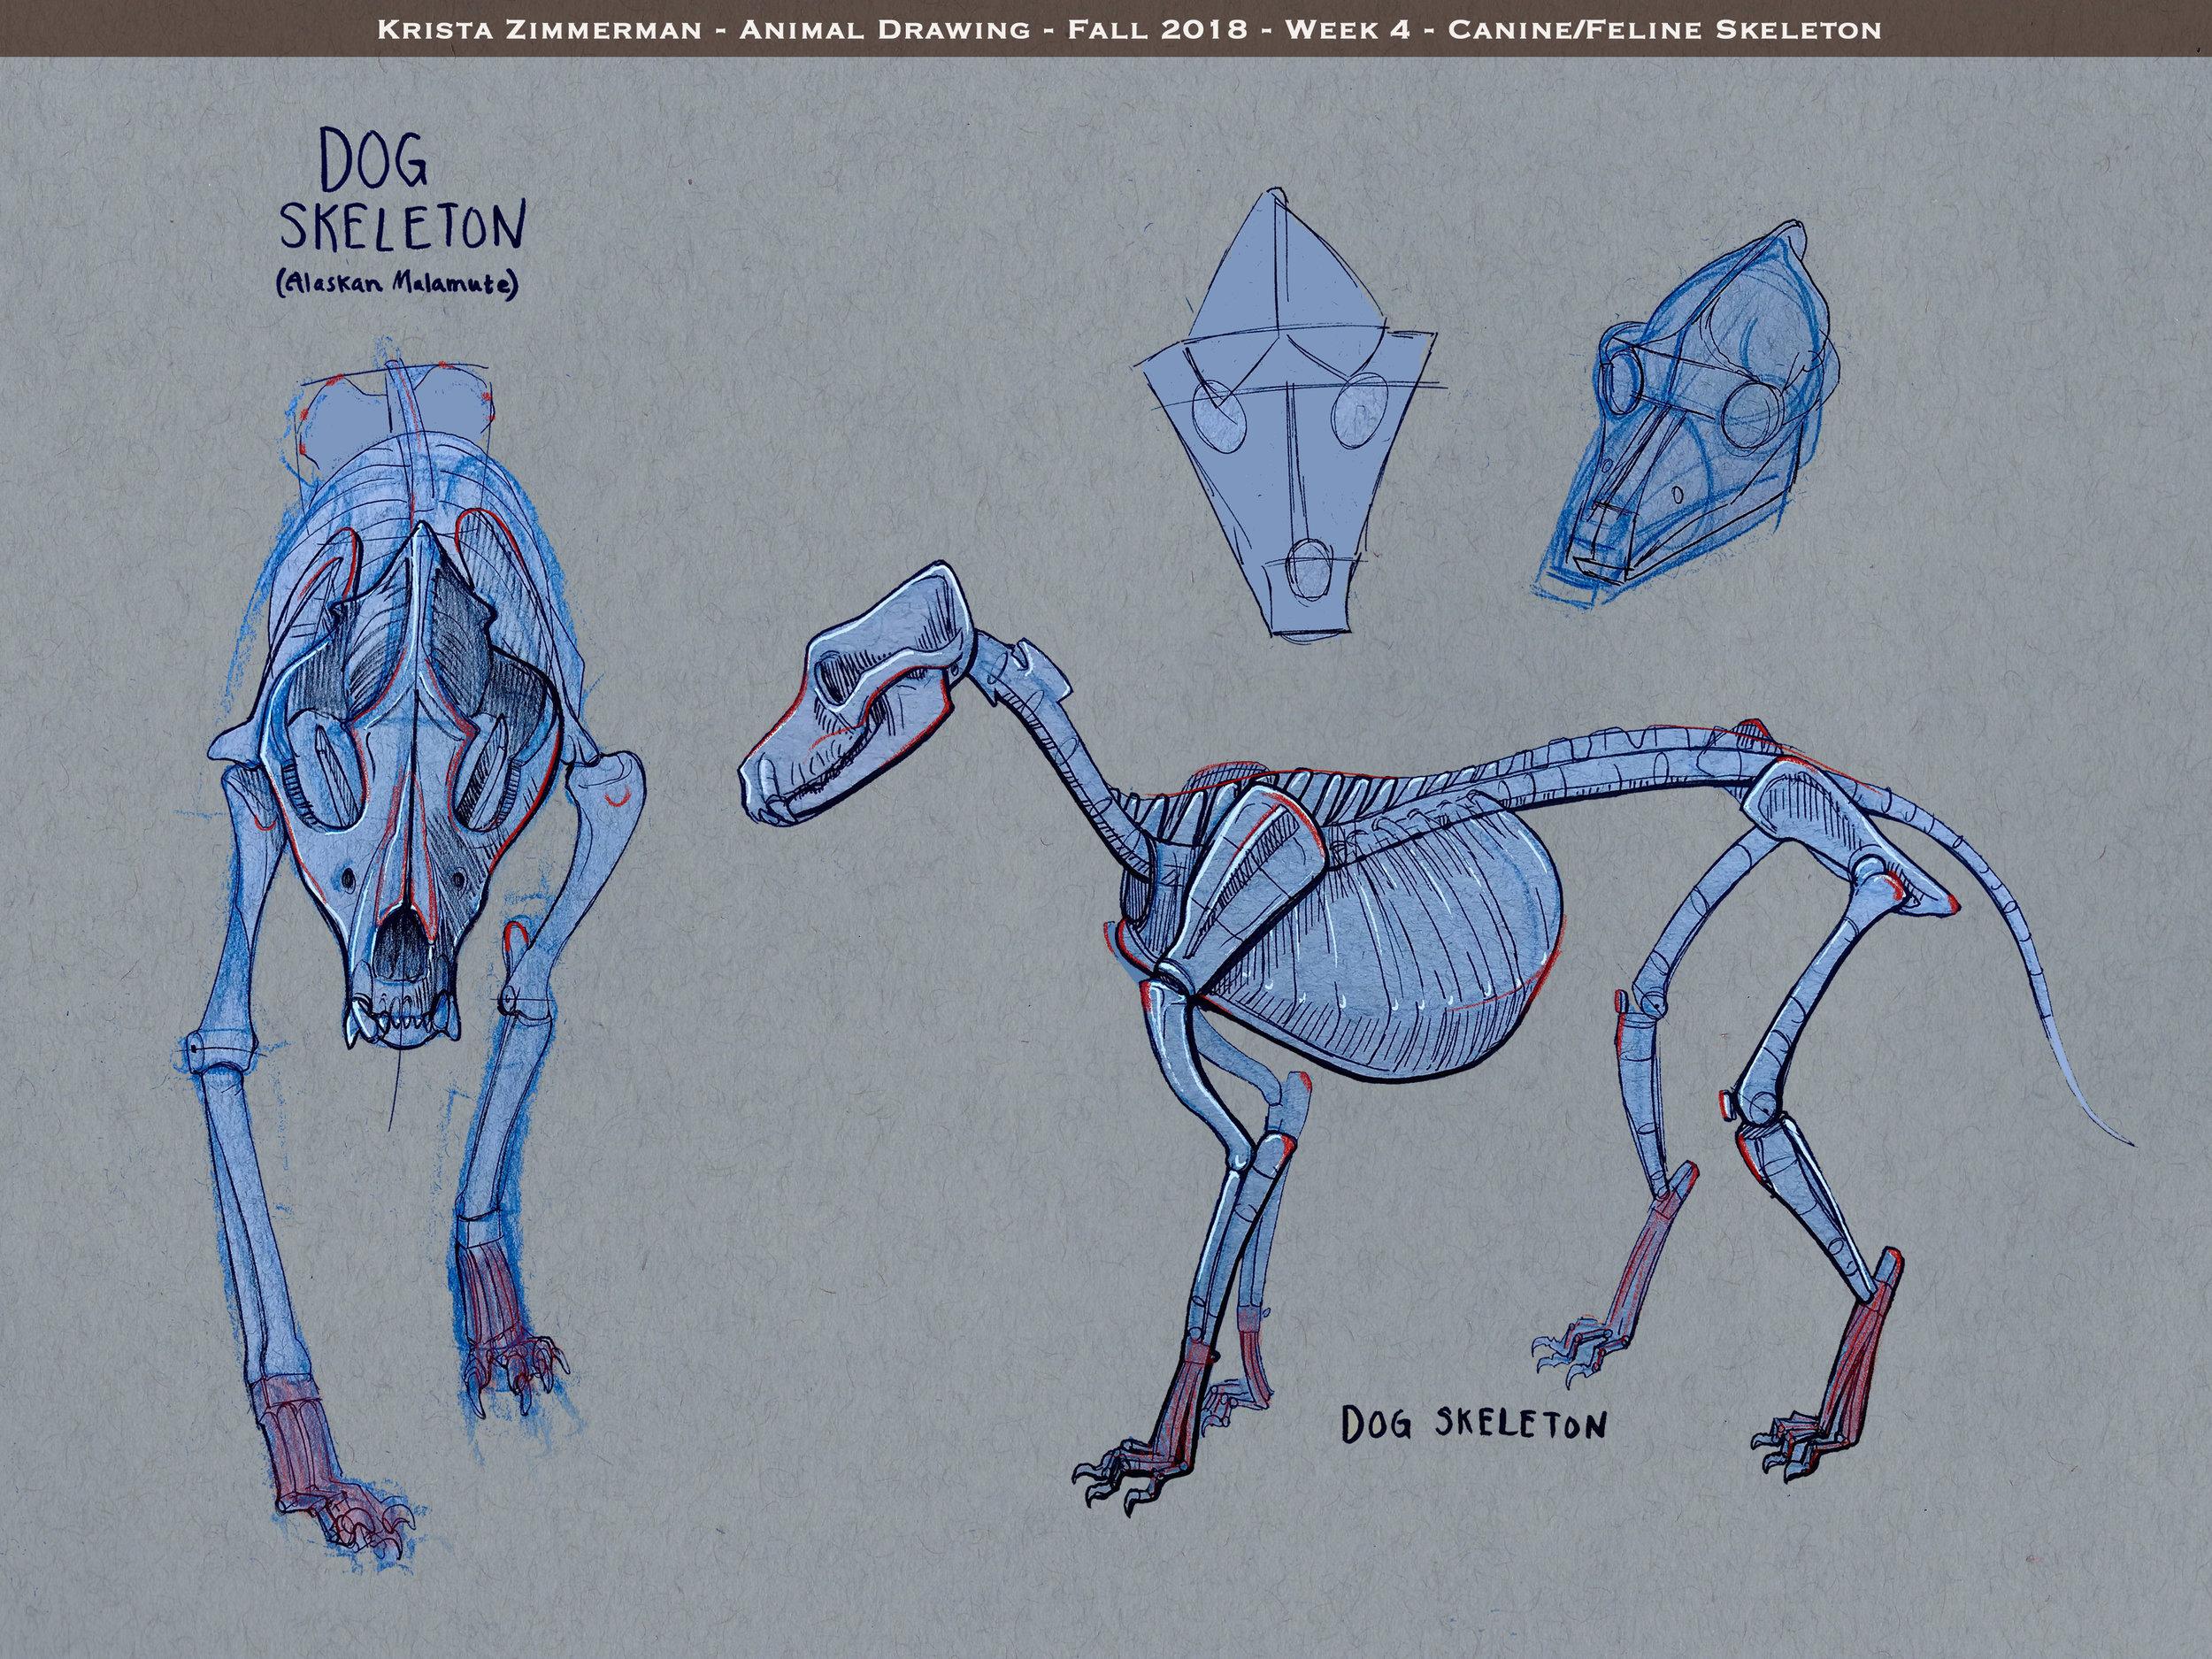 krista_zimmerman-animal_drawing_-wk4-976466088.jpg